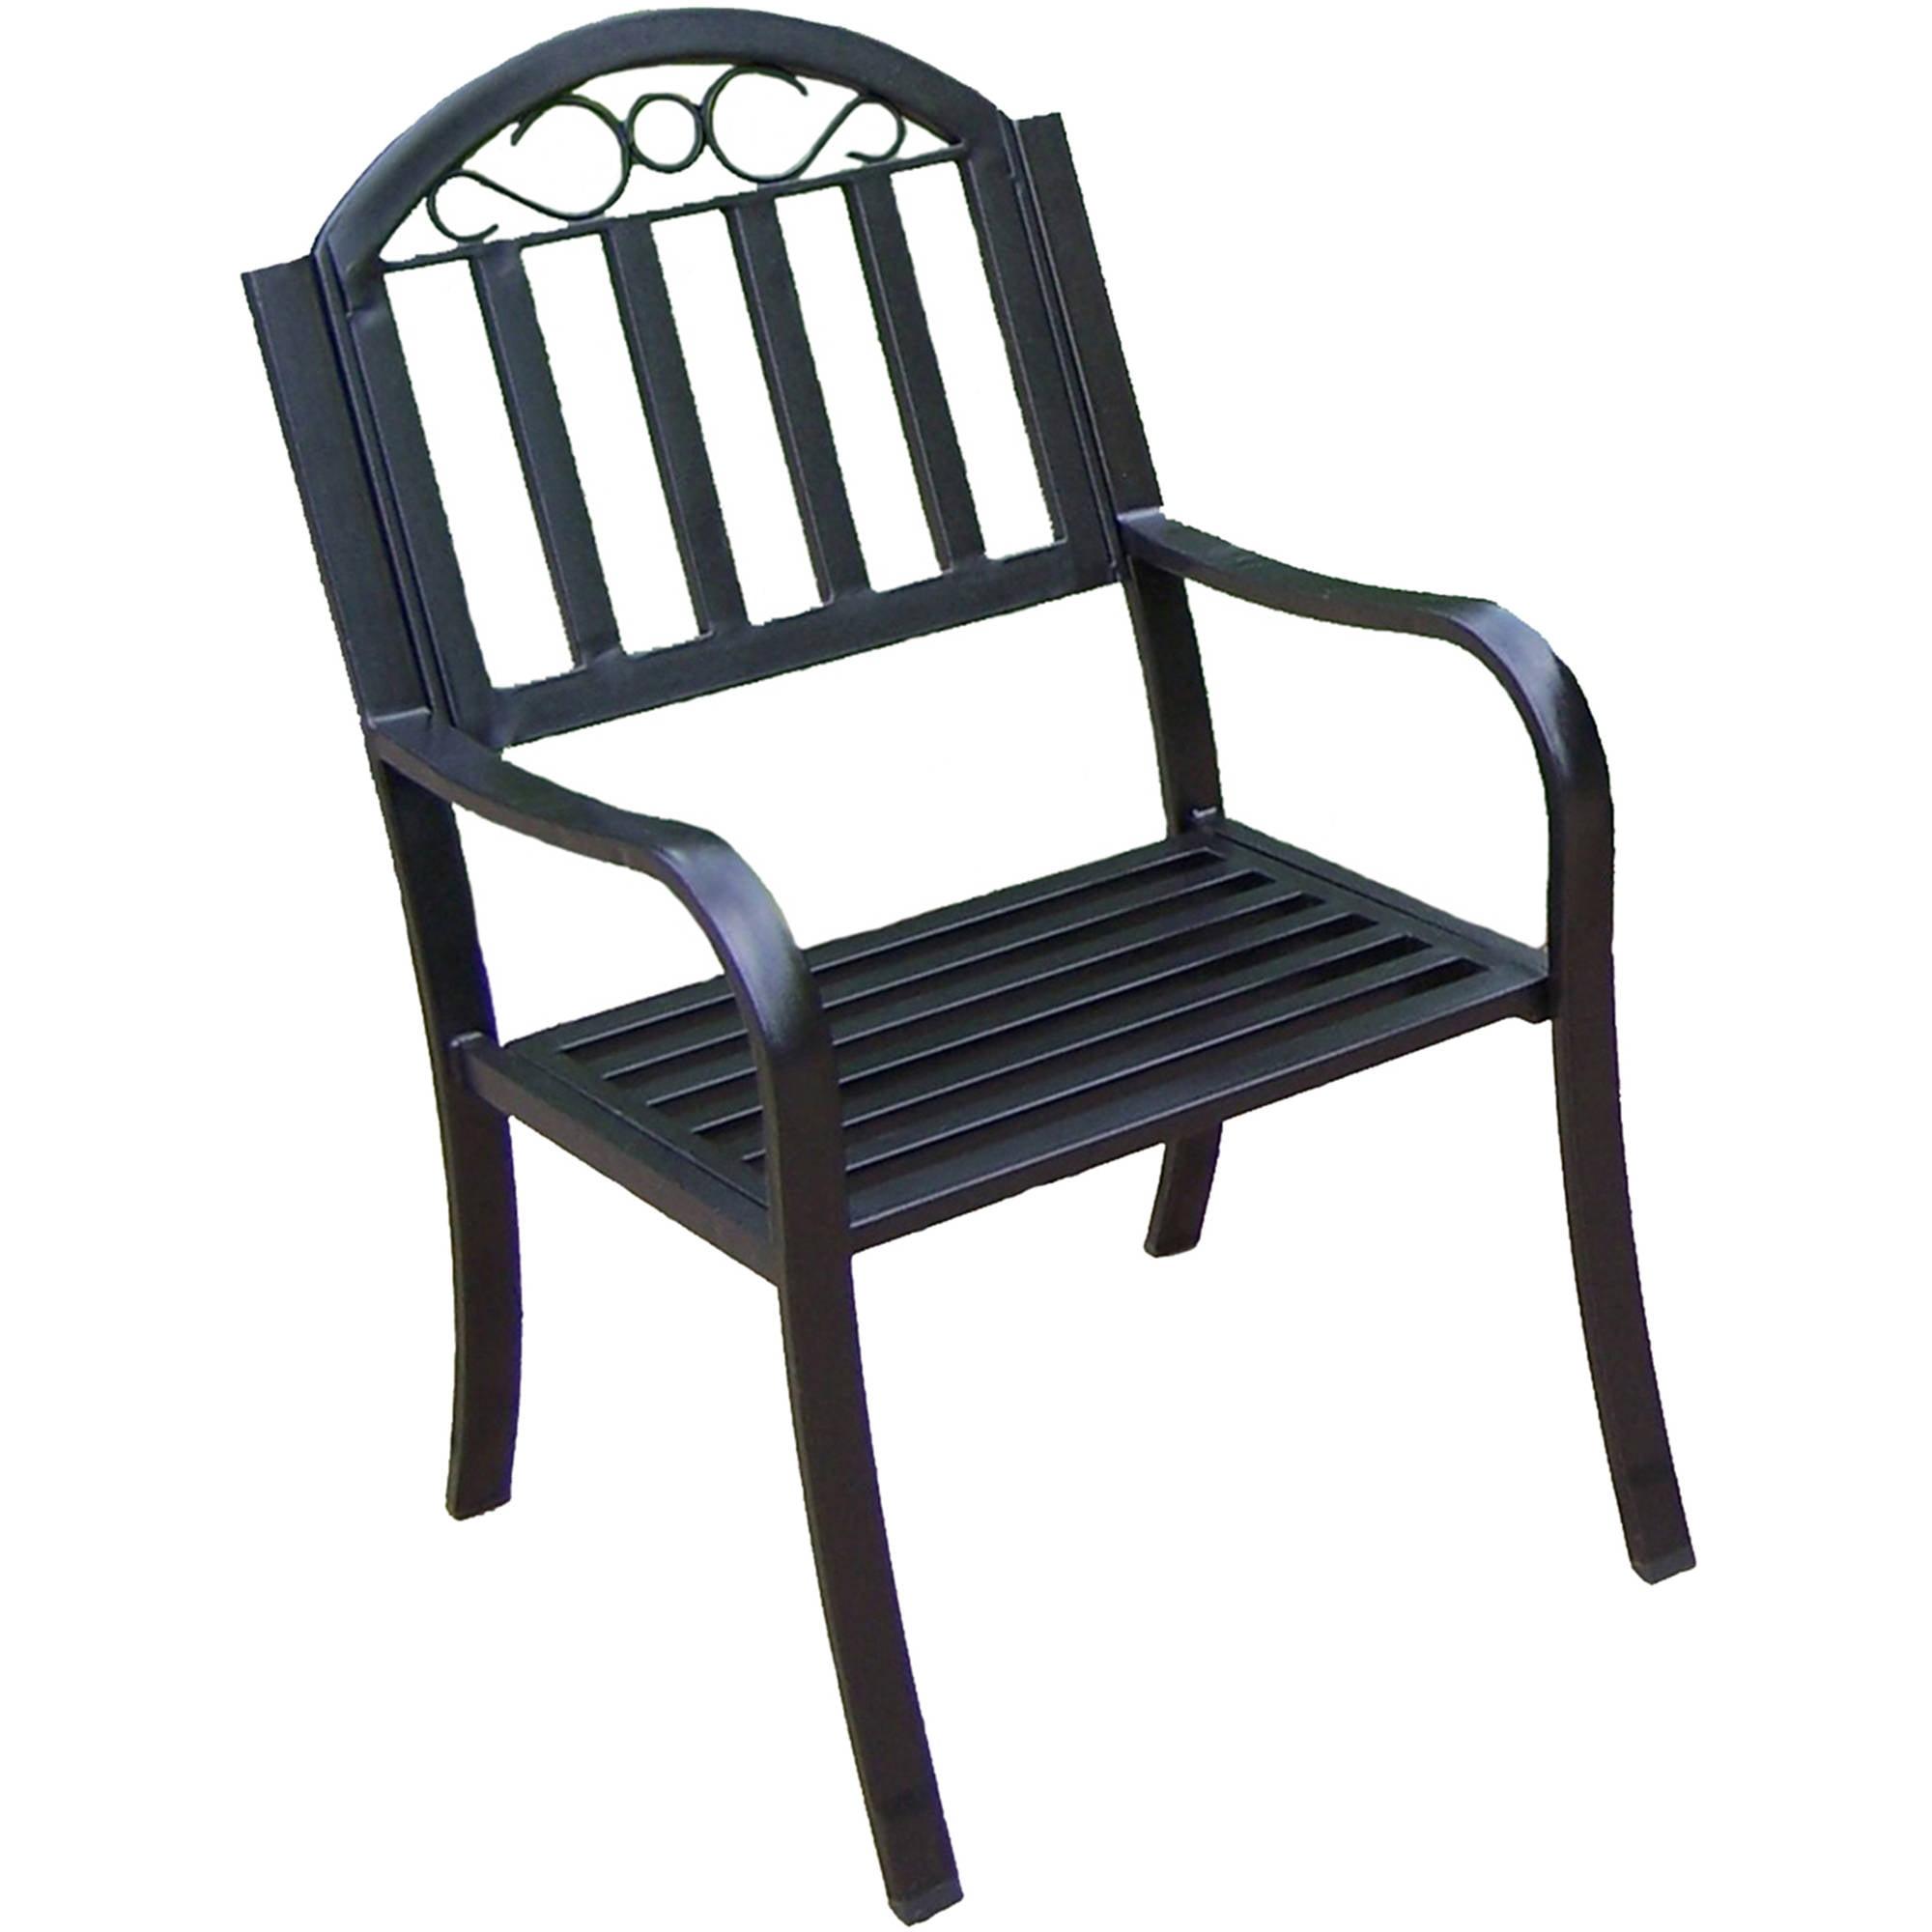 Rochester Arm Chair, Hammertone Bronze